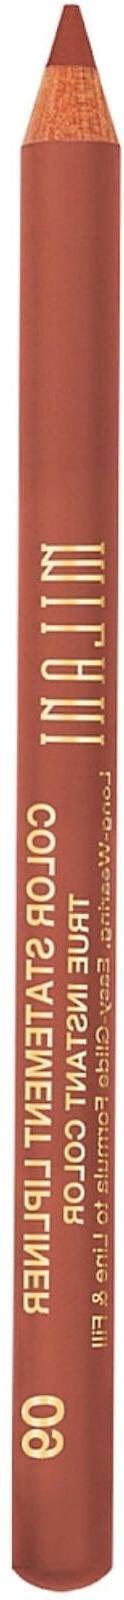 Milani Color Statement Lip Liner, Spice 0.04 oz